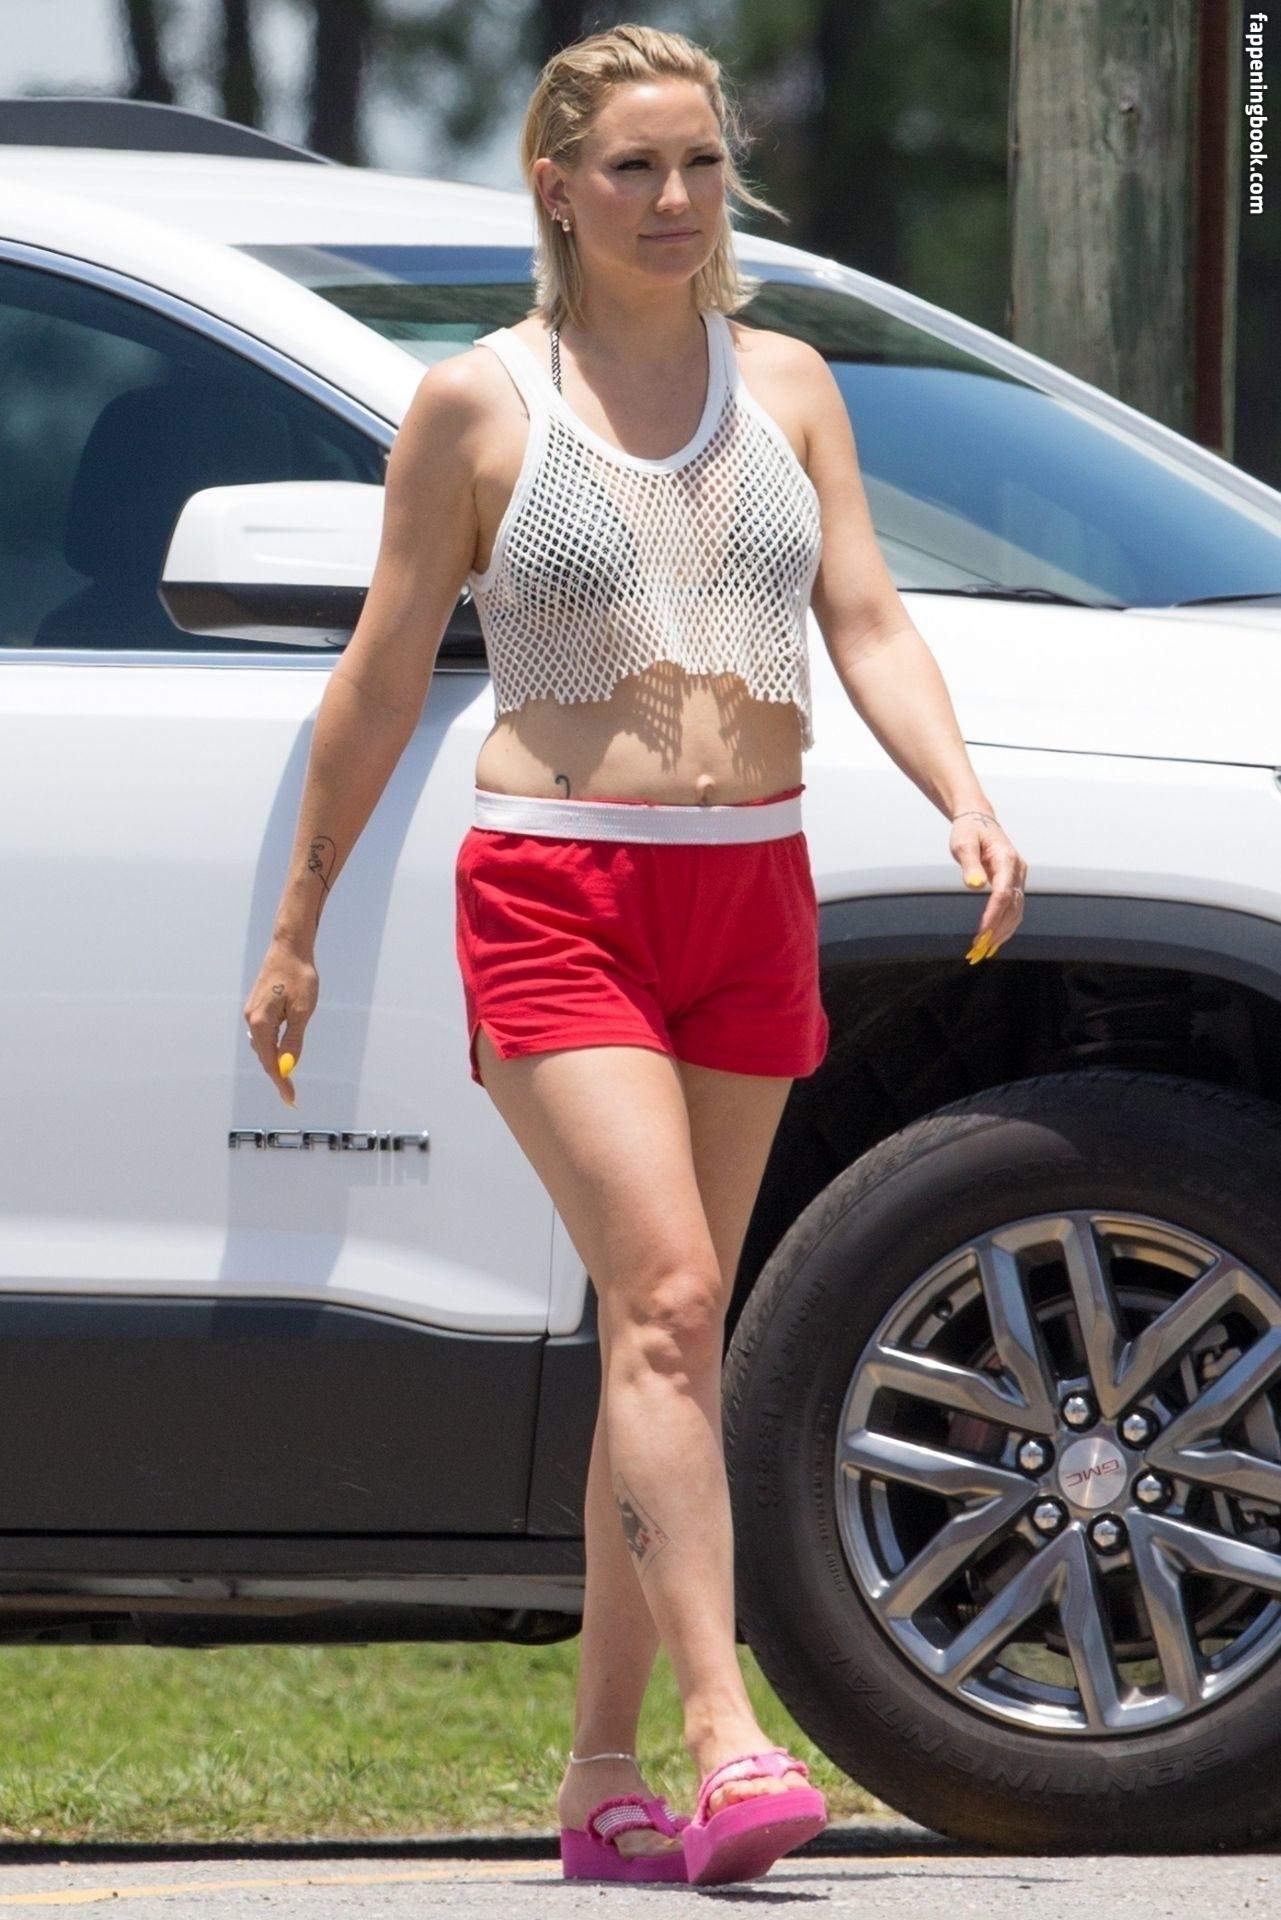 Kate Hudson masterminded naked booty pic to make toyboy